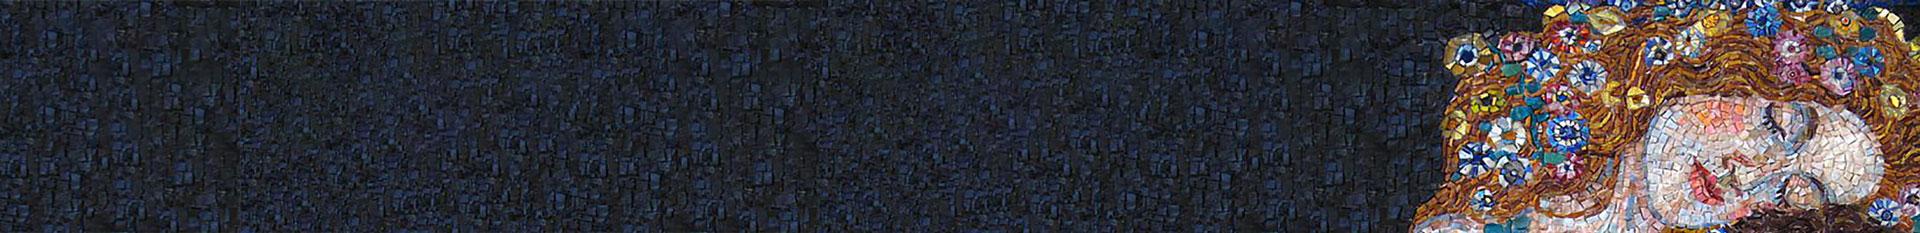 Mosaic Materials 1 - متریال های مورد استفاده در معرق کاشی